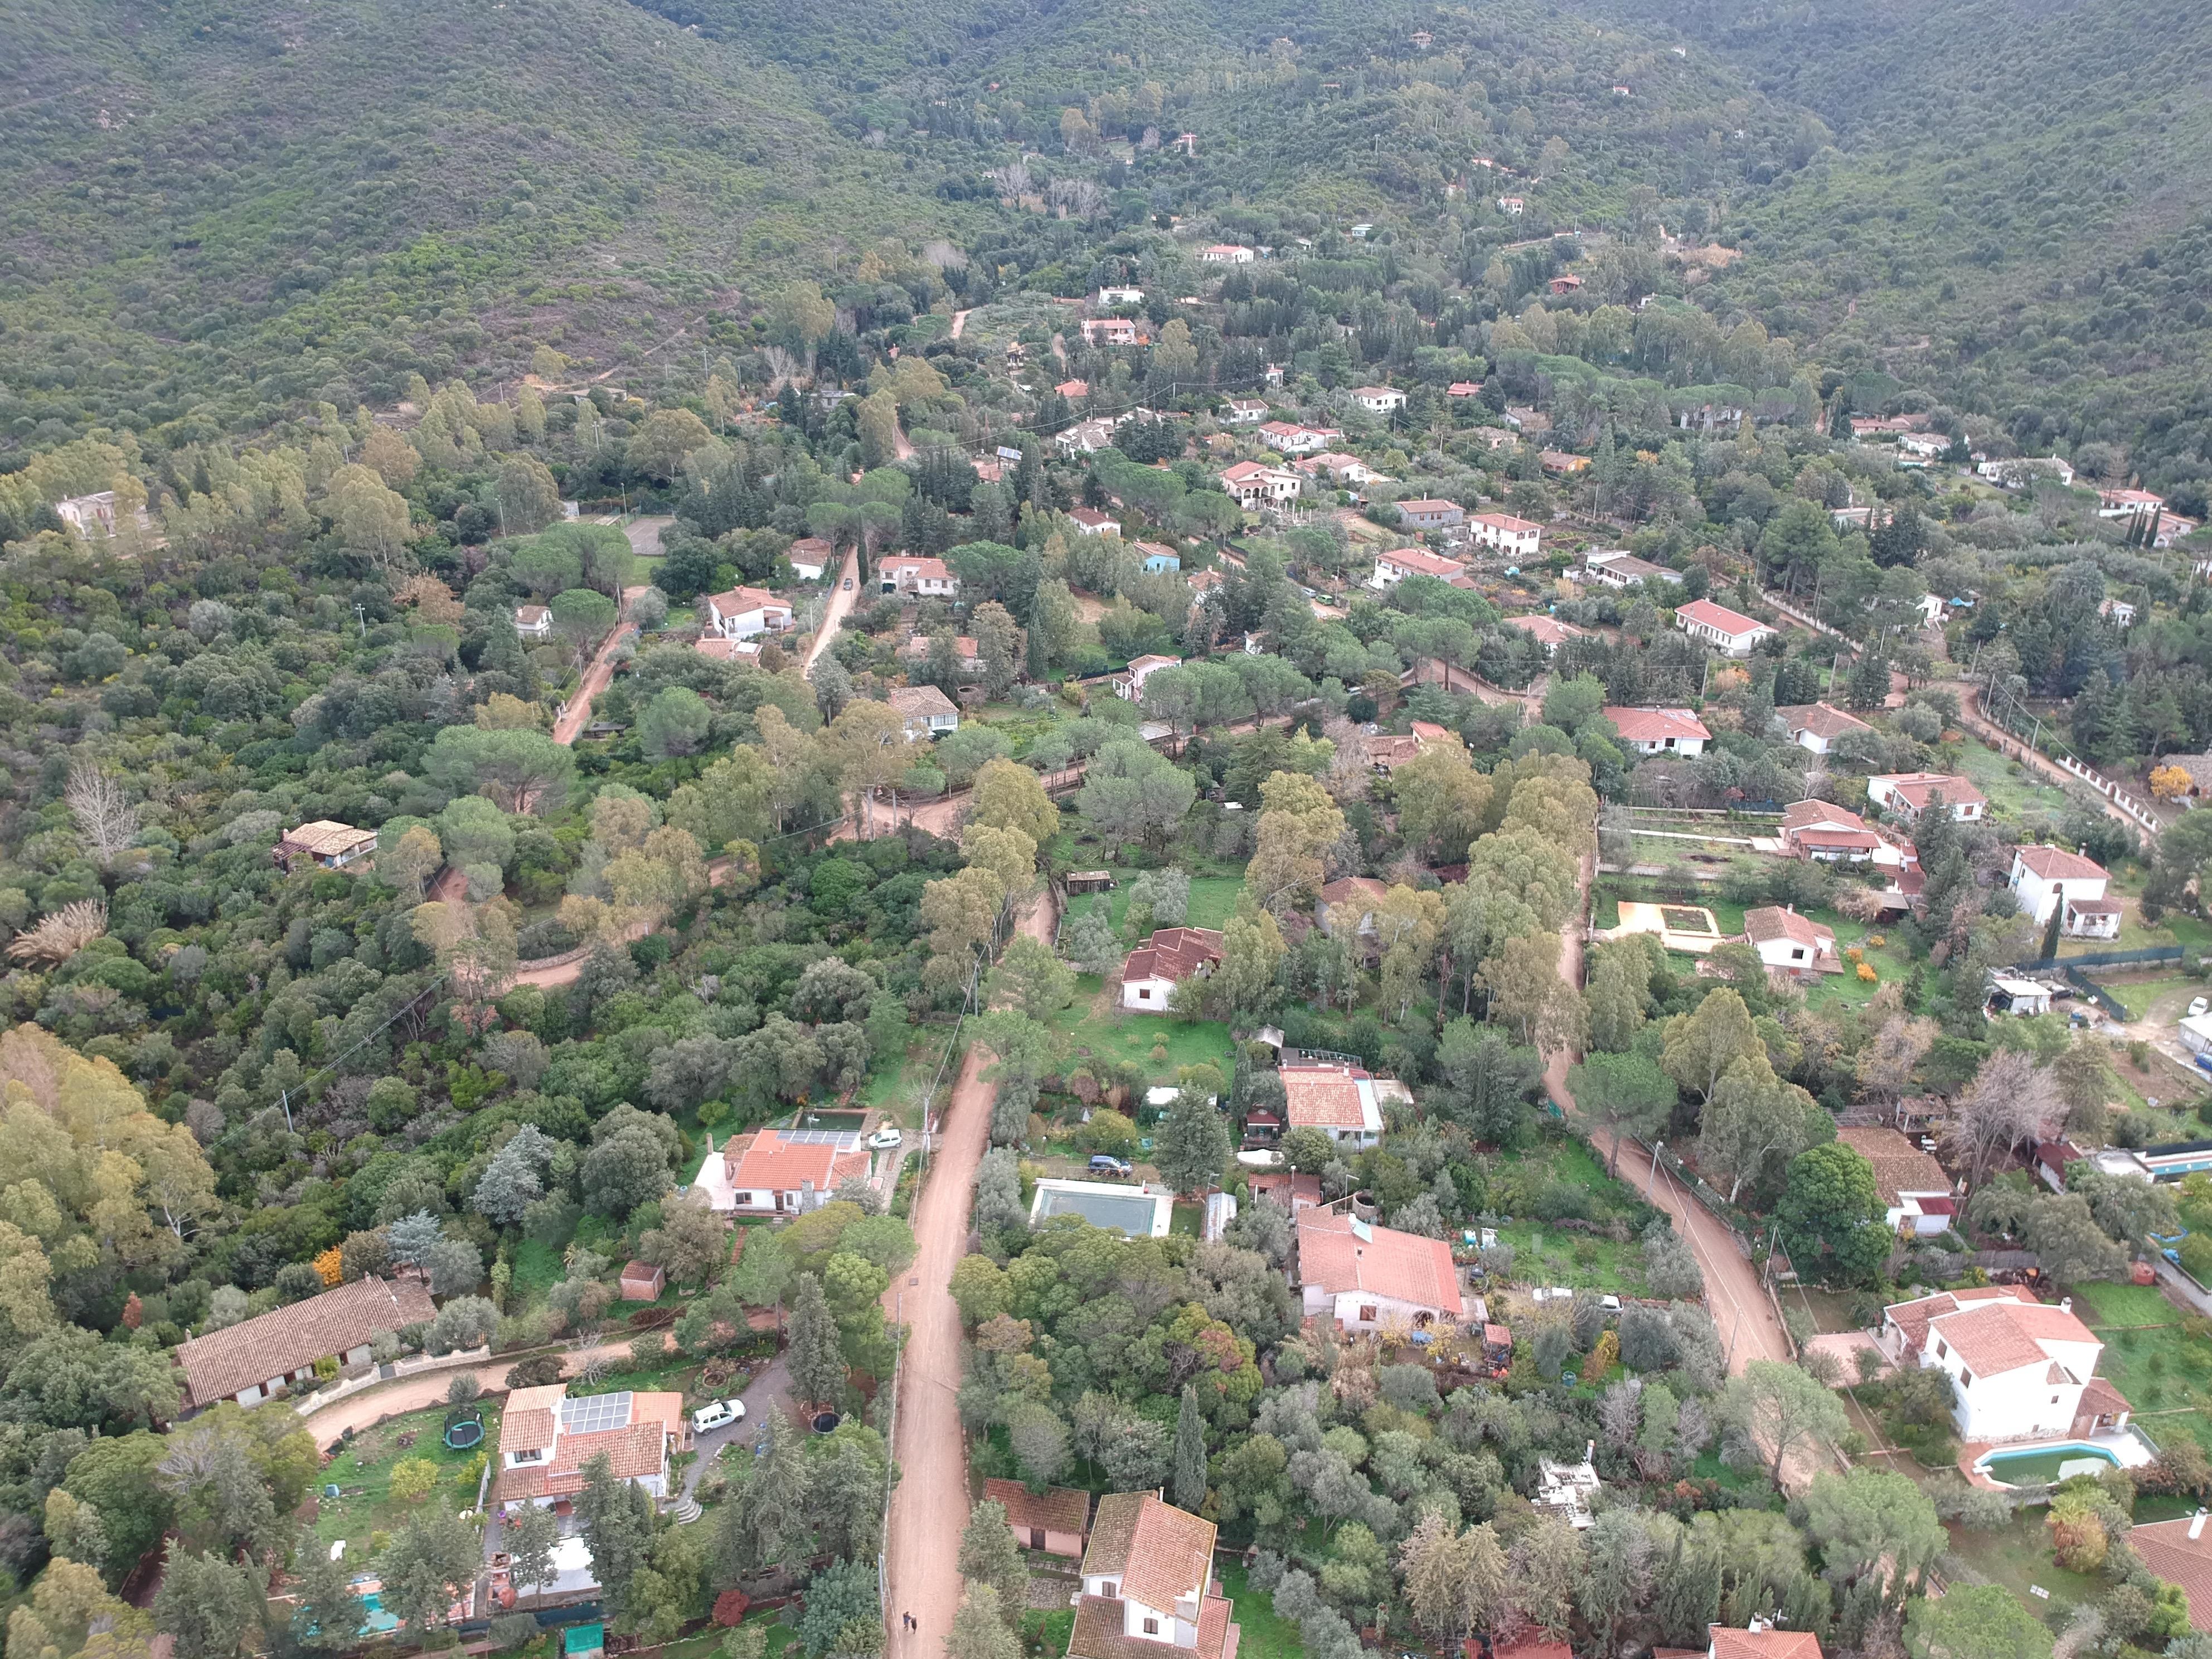 Villaggio Mimose 2